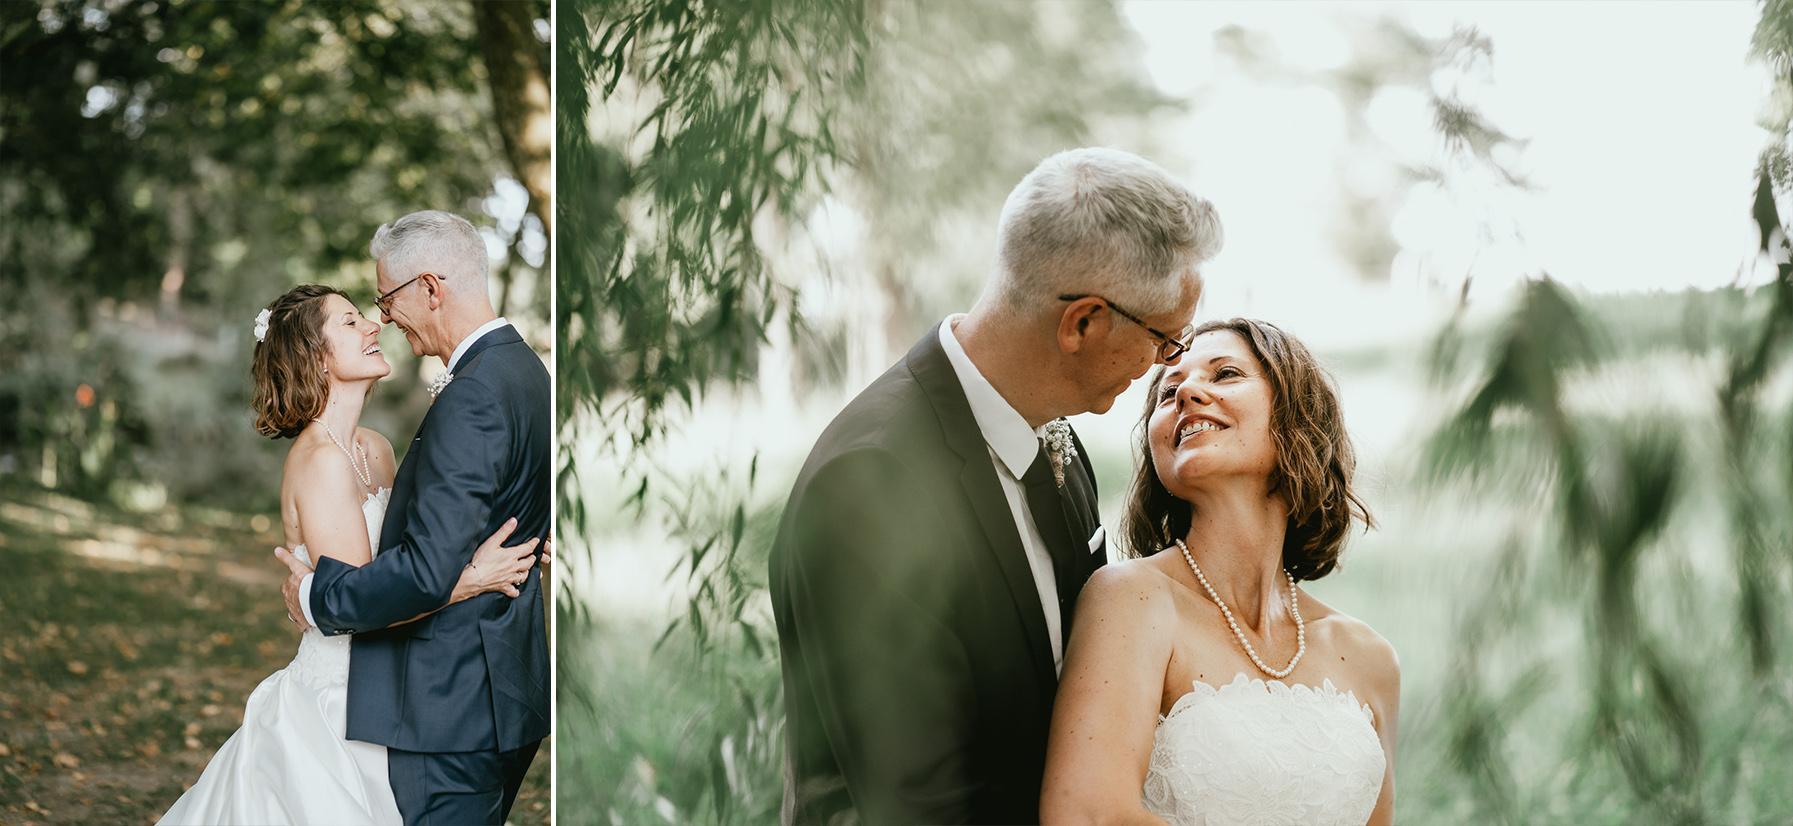 Photographe mariage landes dax aquitaine 6